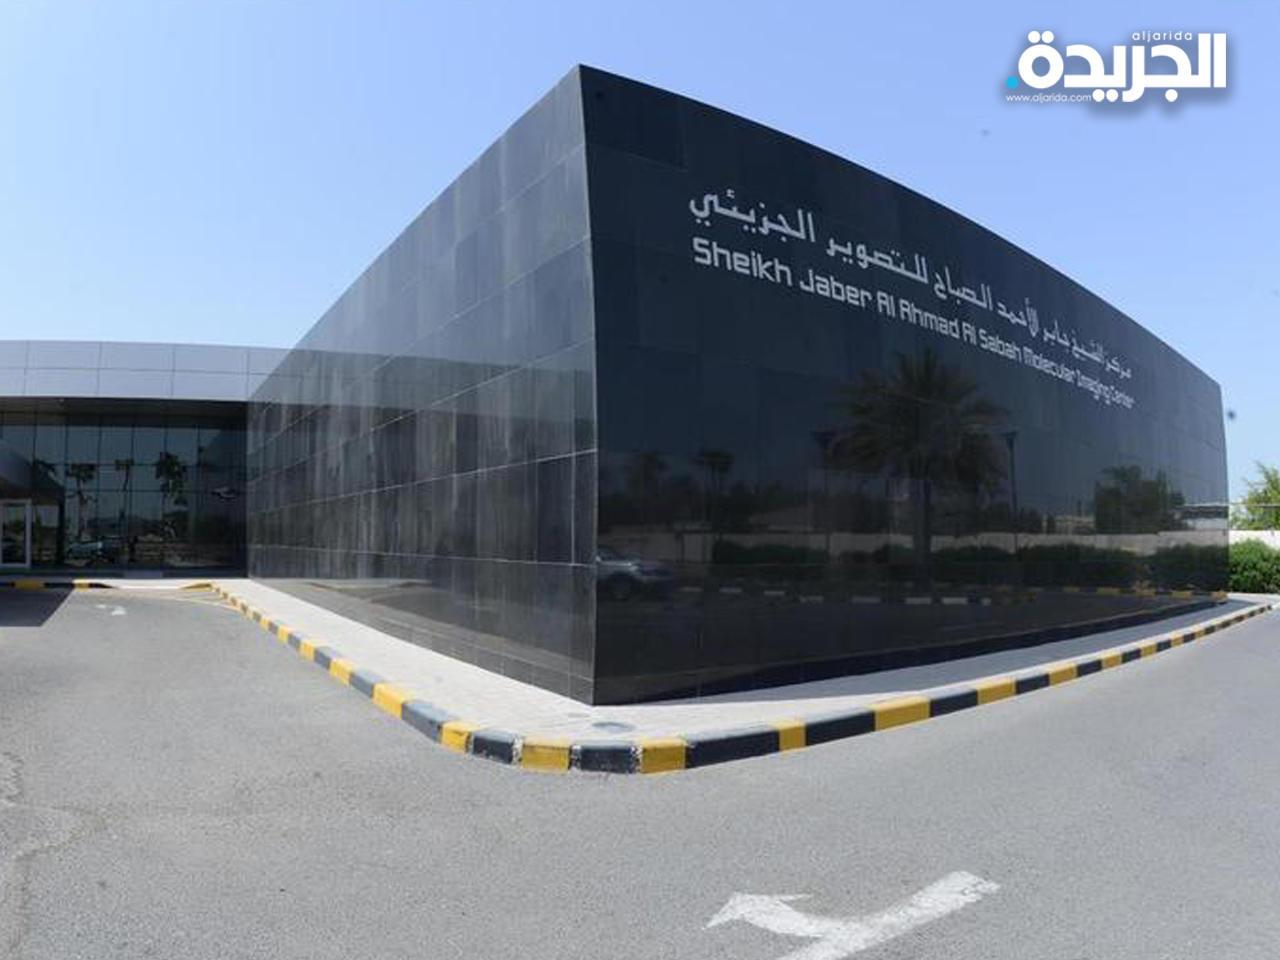 Kuwaiti imaging centre gets EU accreditation